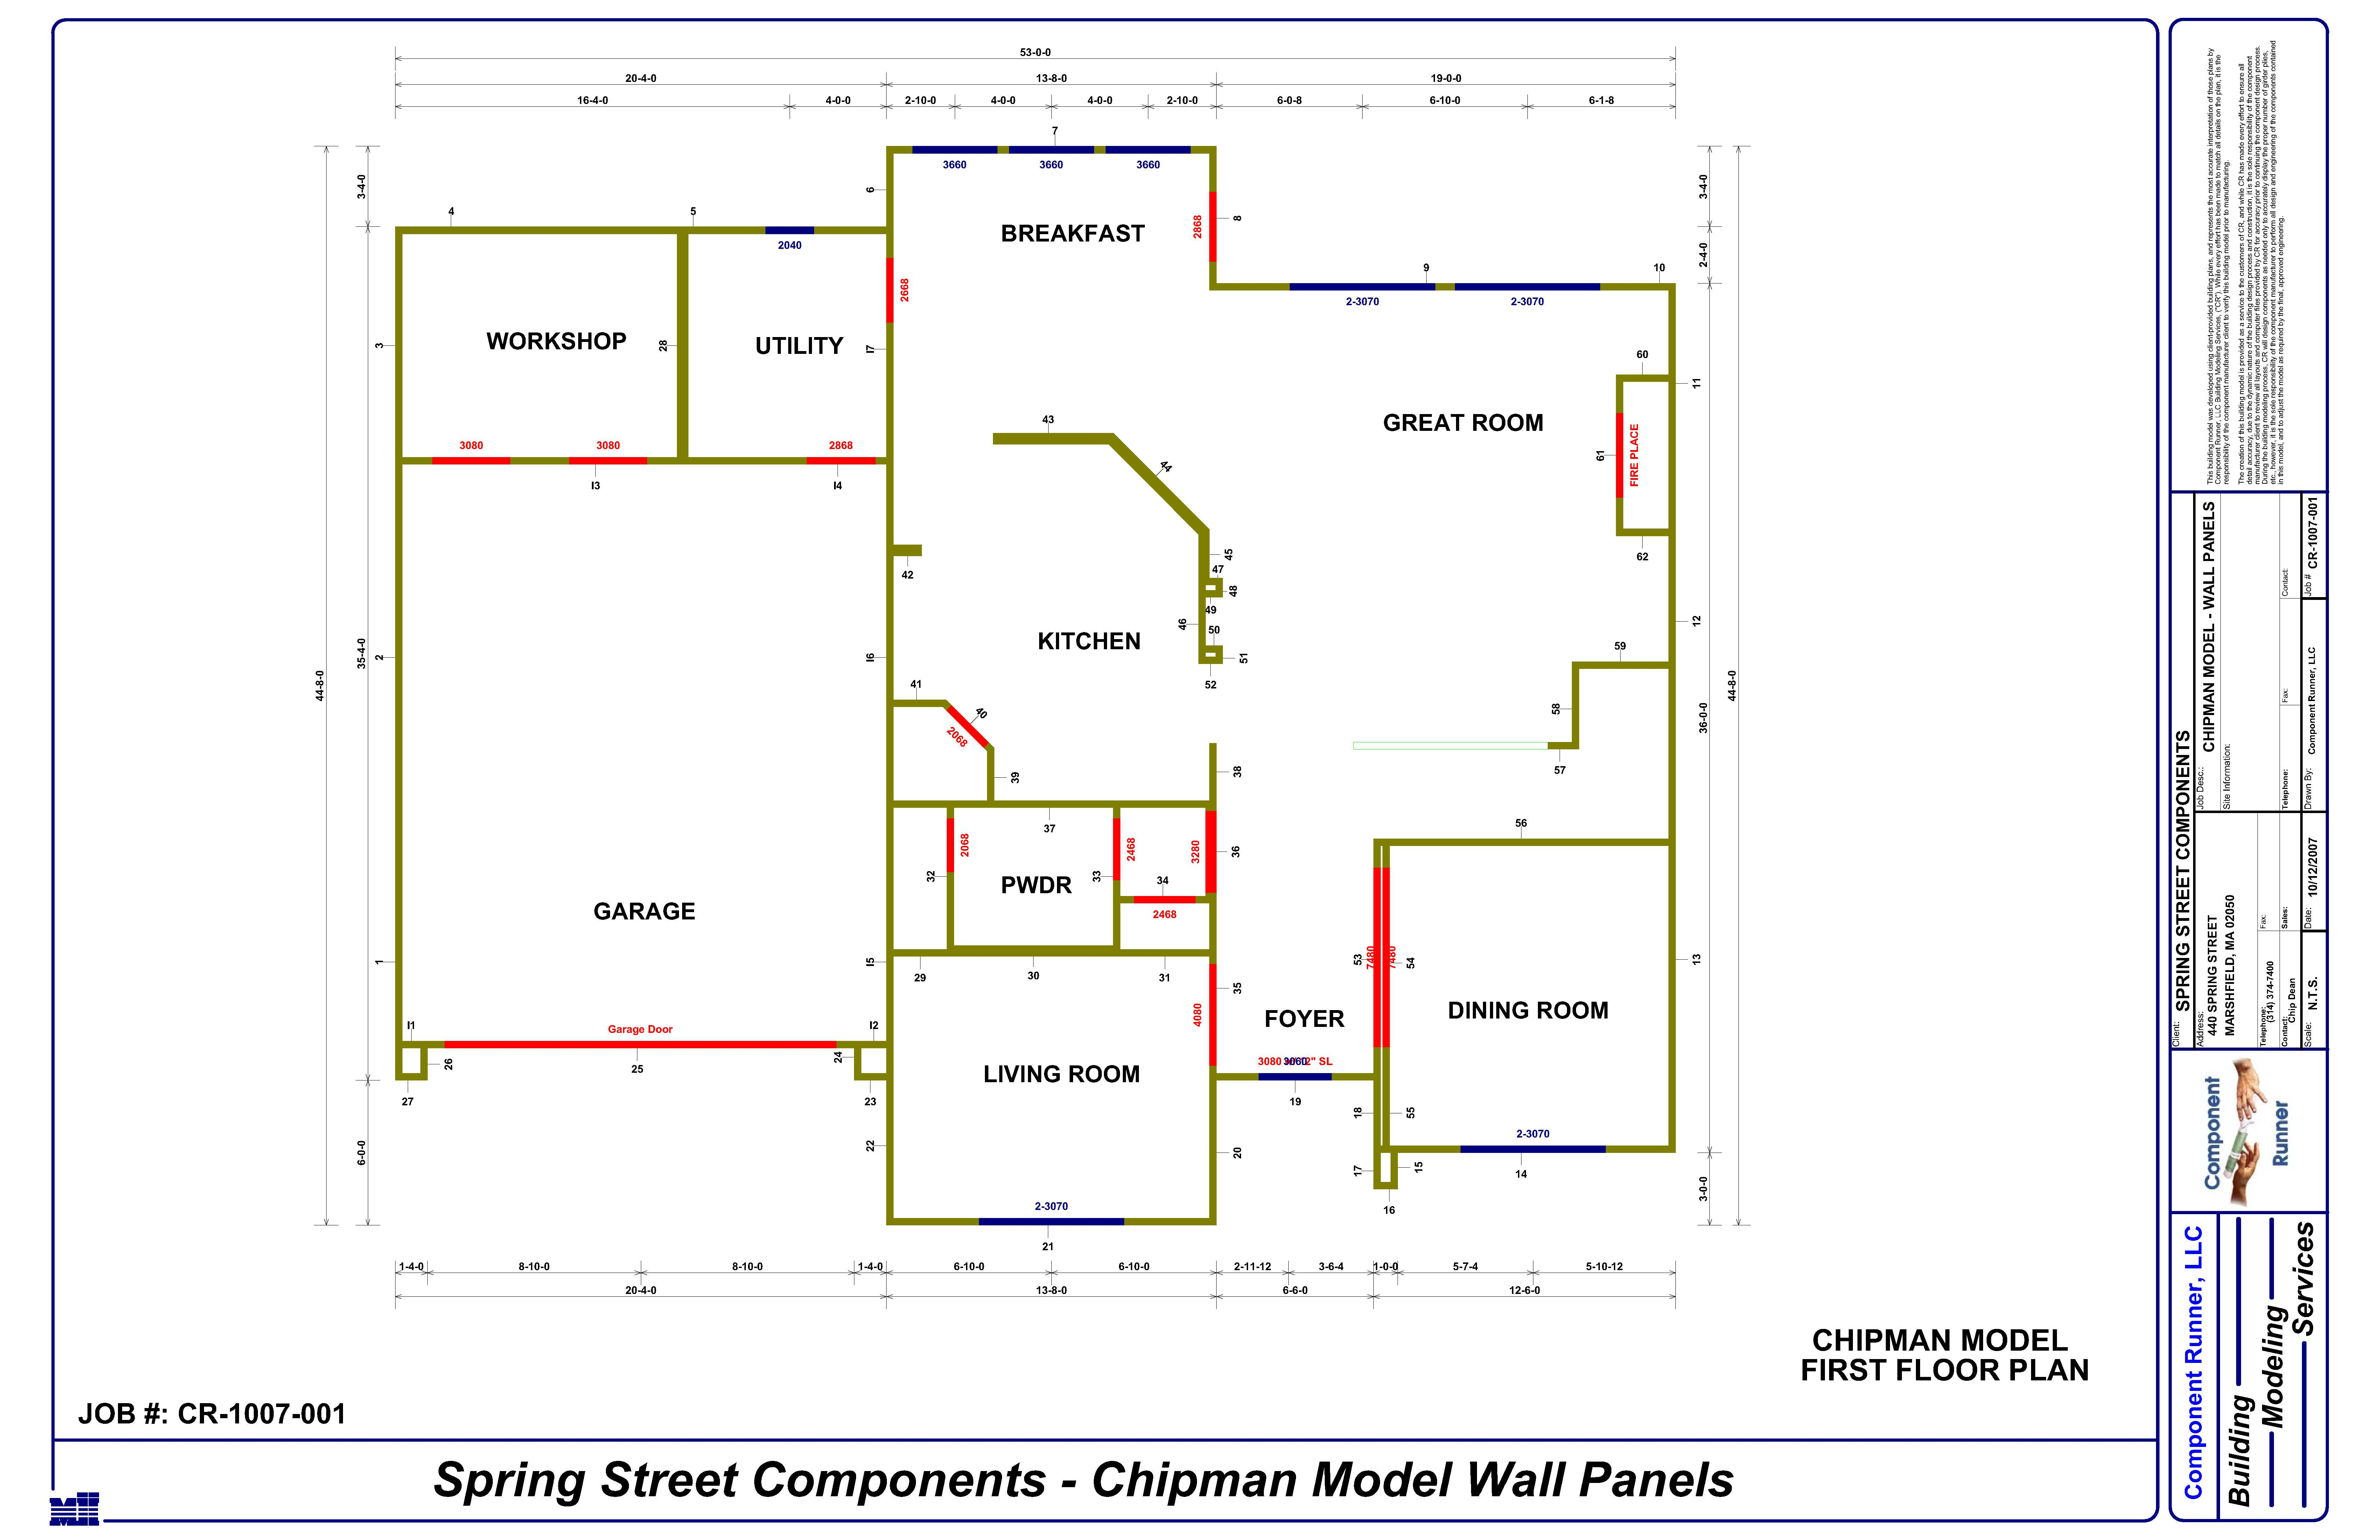 Wall Framing and Panelization